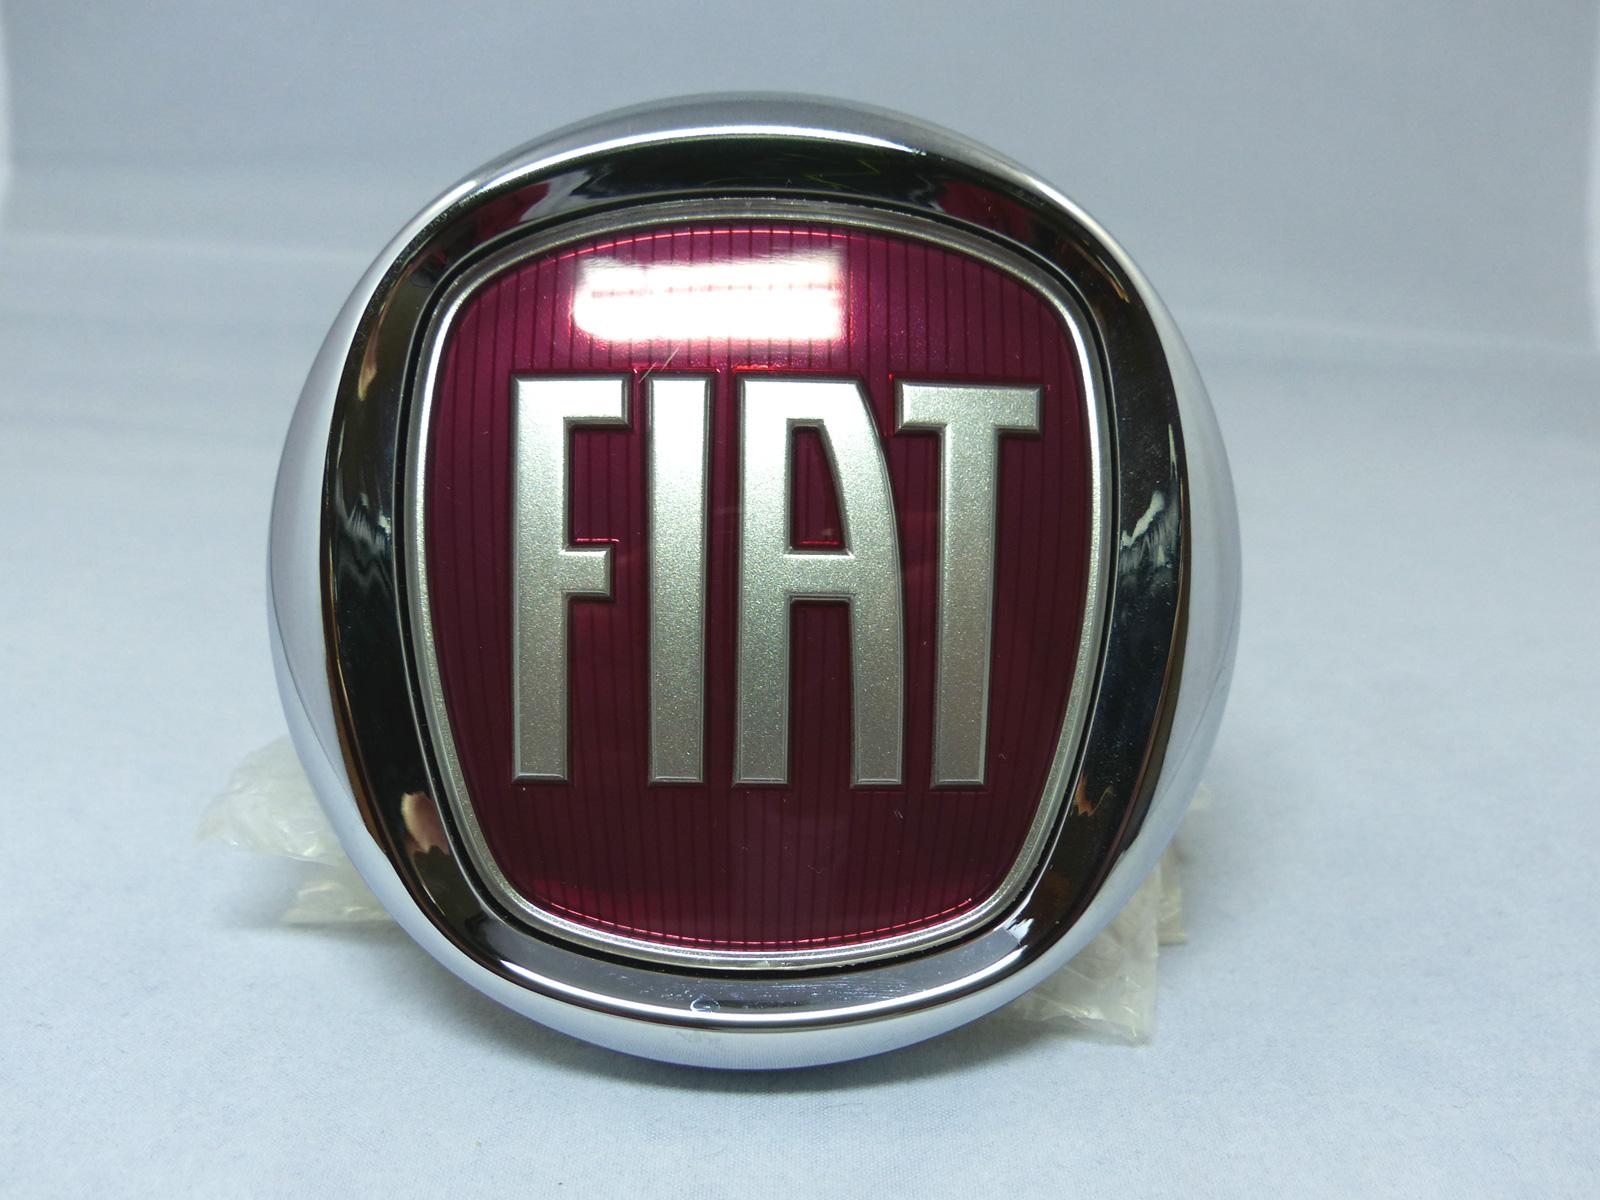 Fiat Bravo Punto Evo Emblem Logo HECK elektrischem Schalter Taster Heckklappe